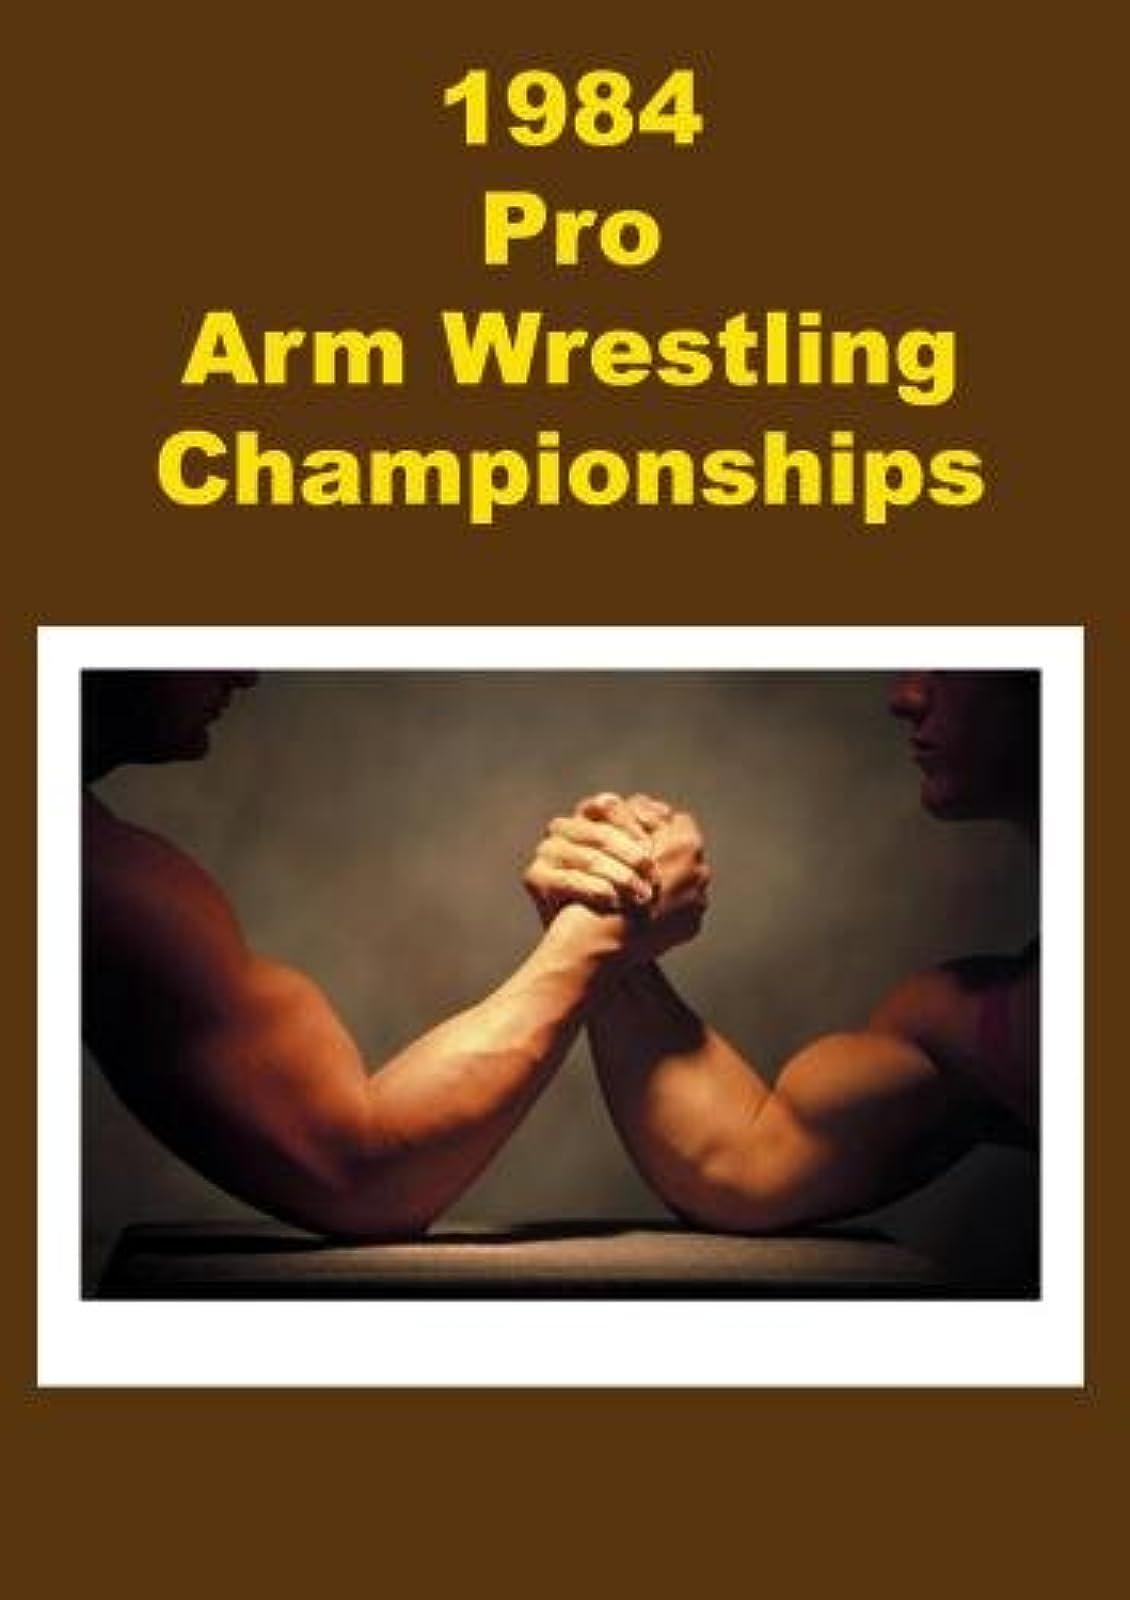 1984 Pro Arm Wrestling Championship On DVD Sports